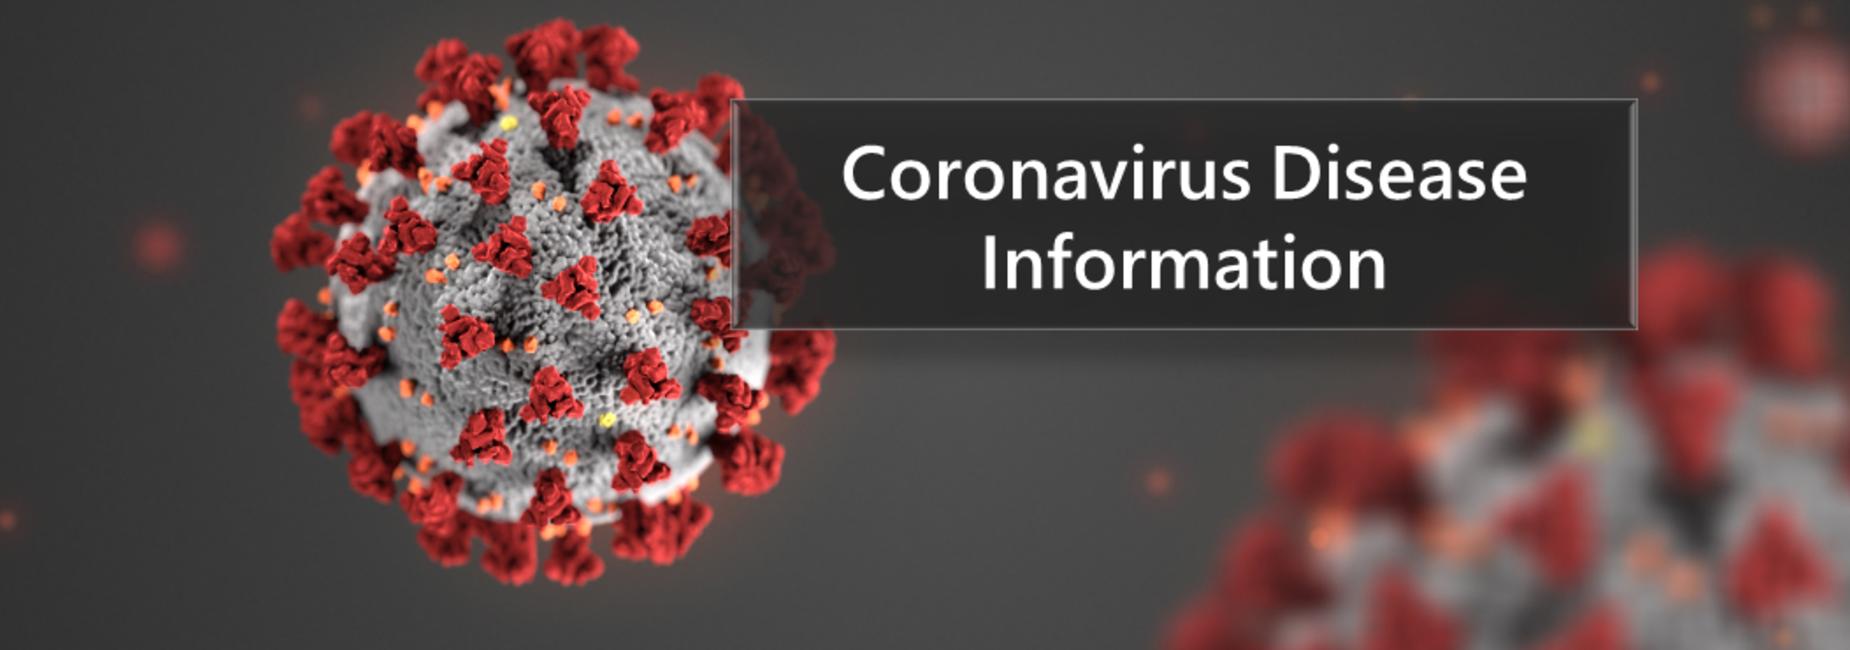 Coronavirus Disease information link